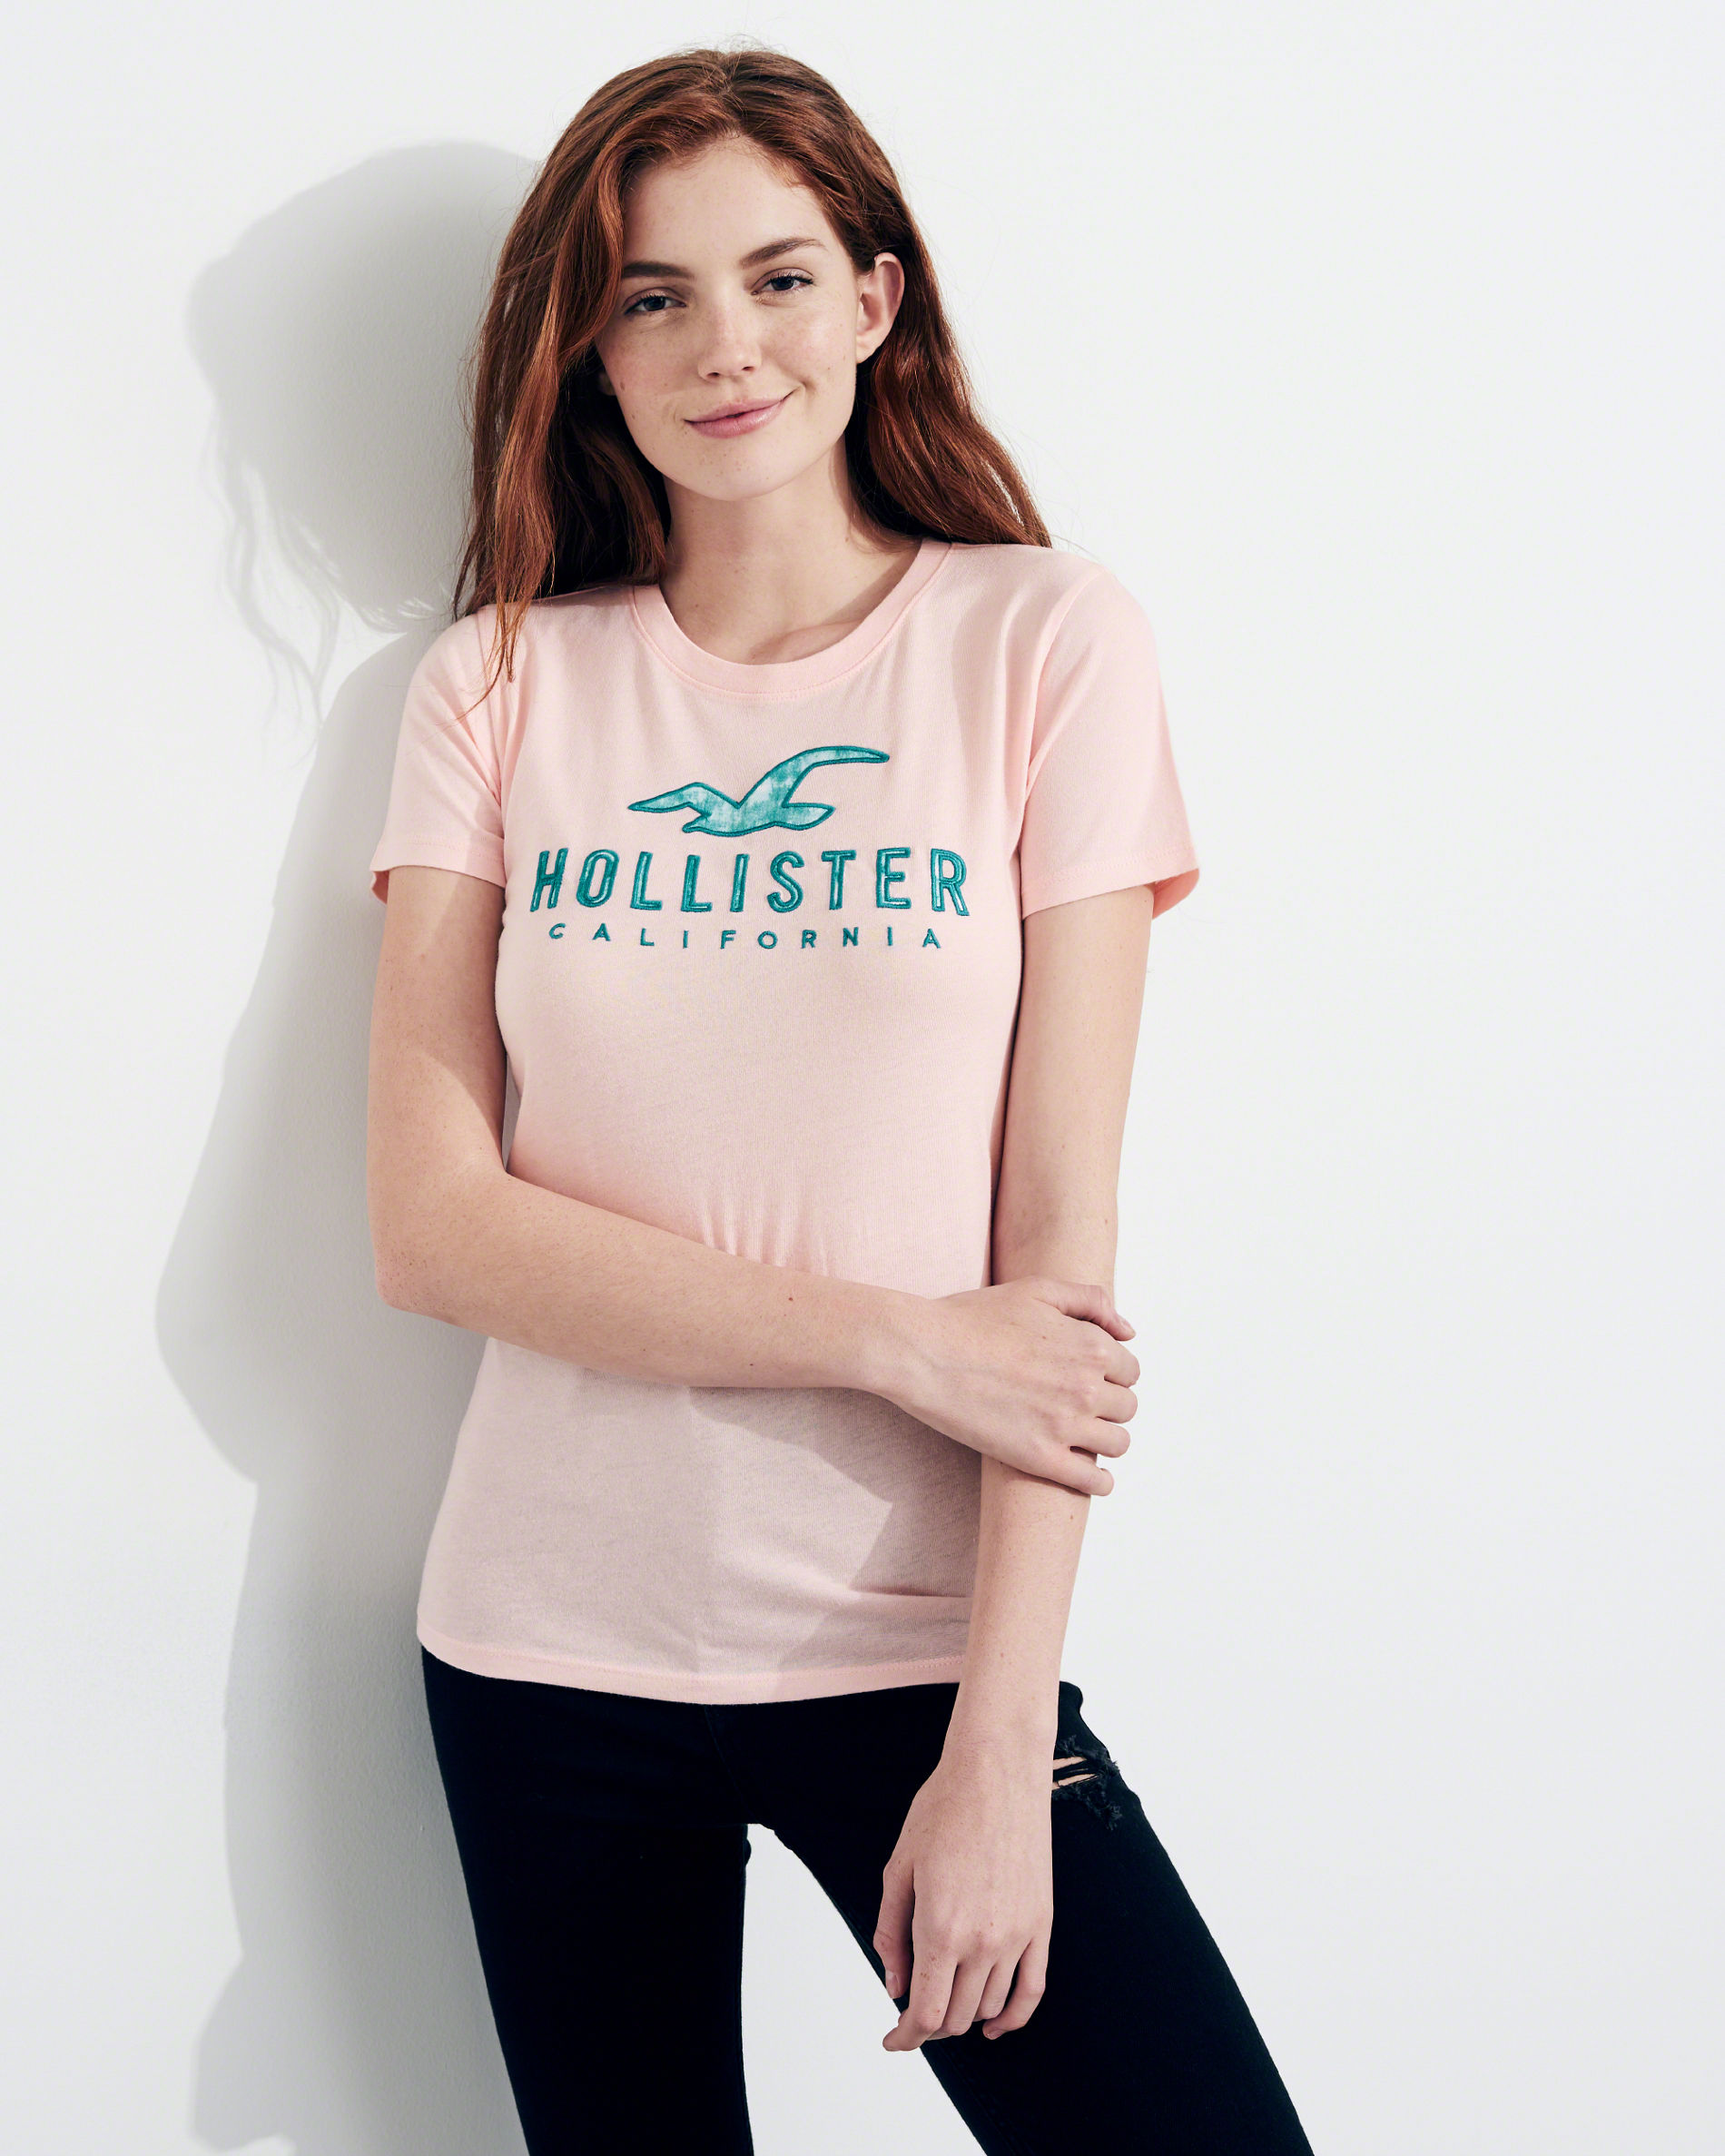 hollister model